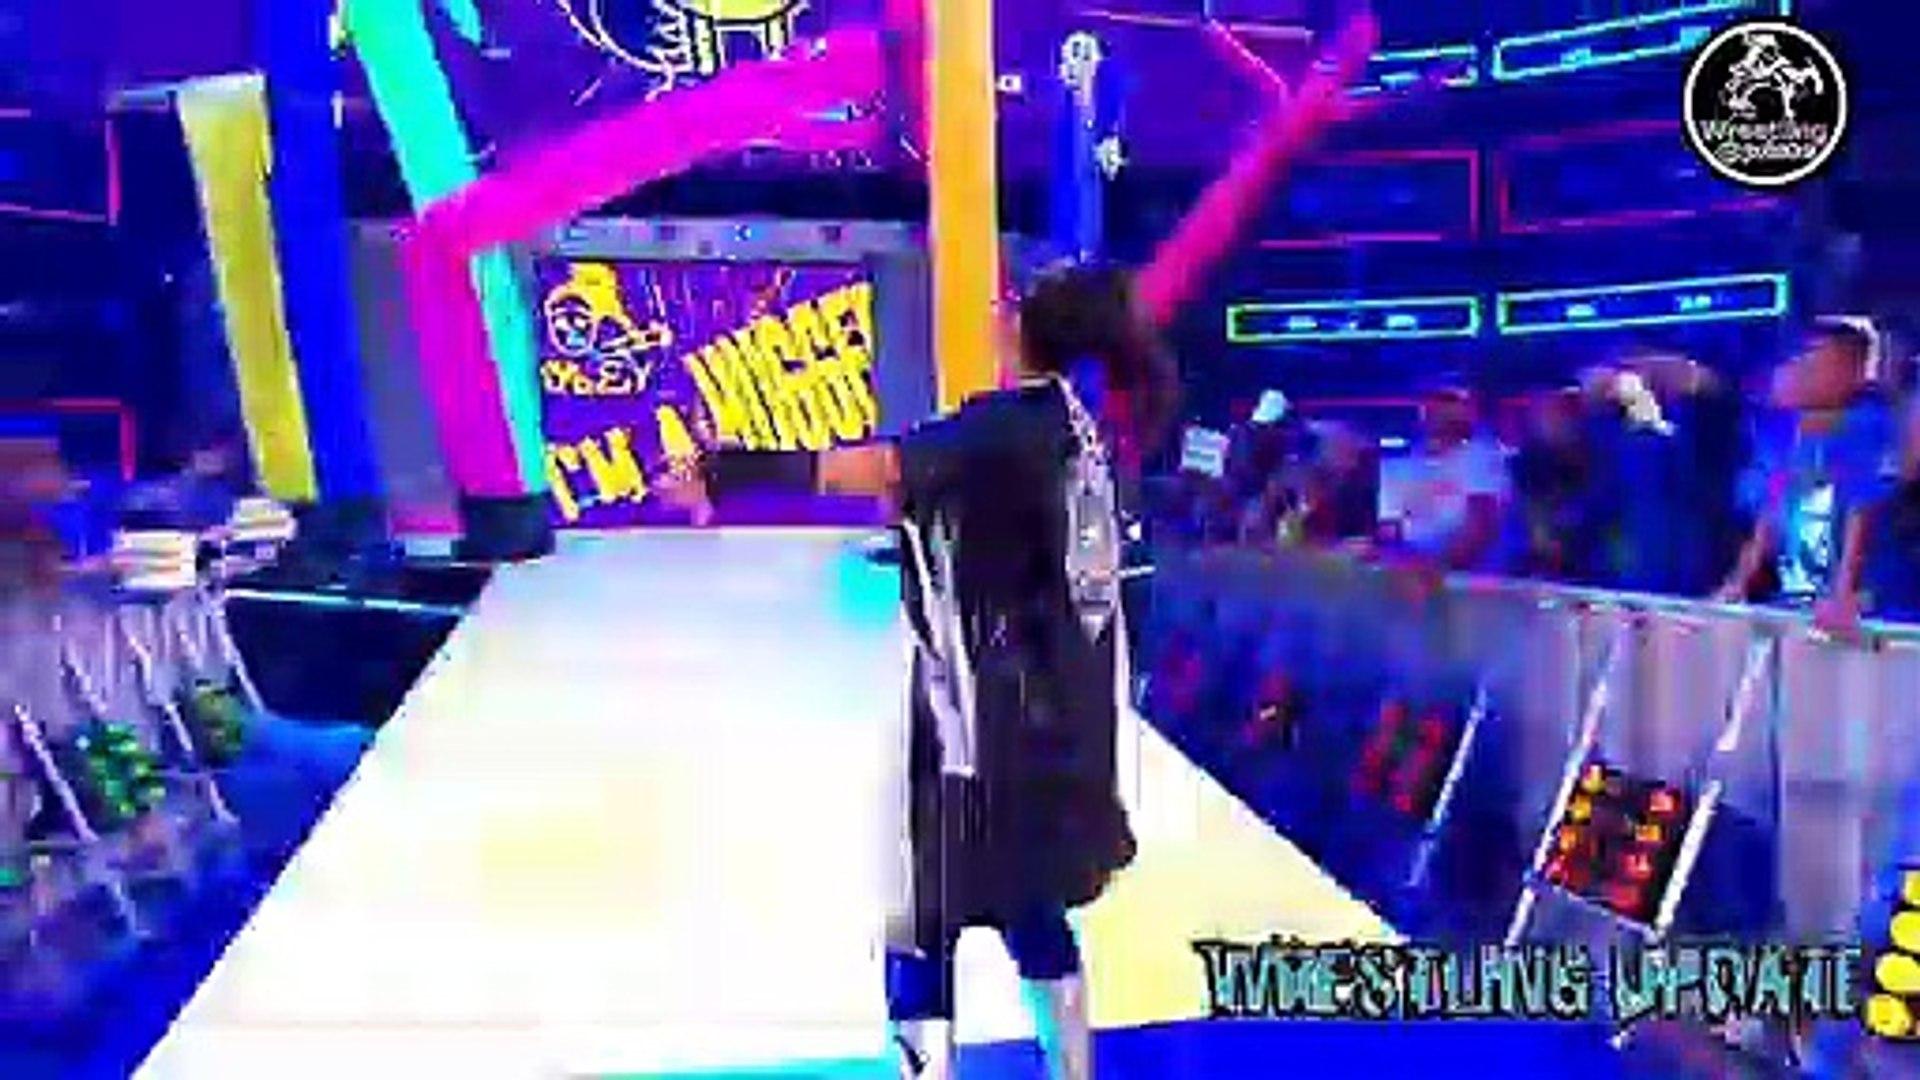 WWE SummerSlam 2019 Highlights - WWE SummerSlam 11th August 2019 Highlights